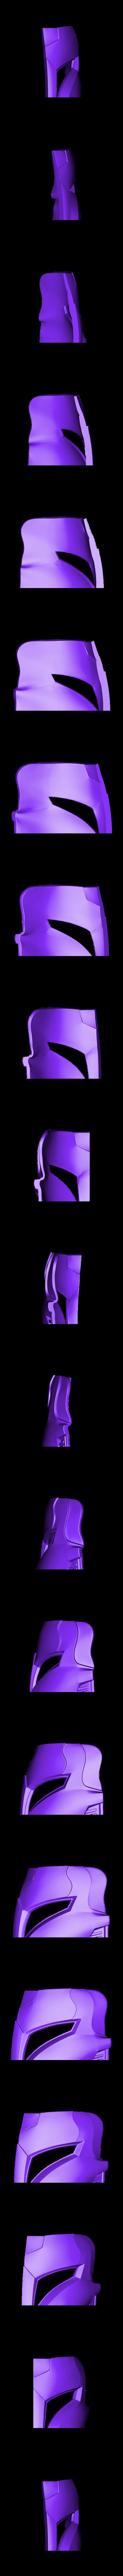 Part_2.stl Download free STL file Arcann Mask Star Wars • 3D print template, VillainousPropShop